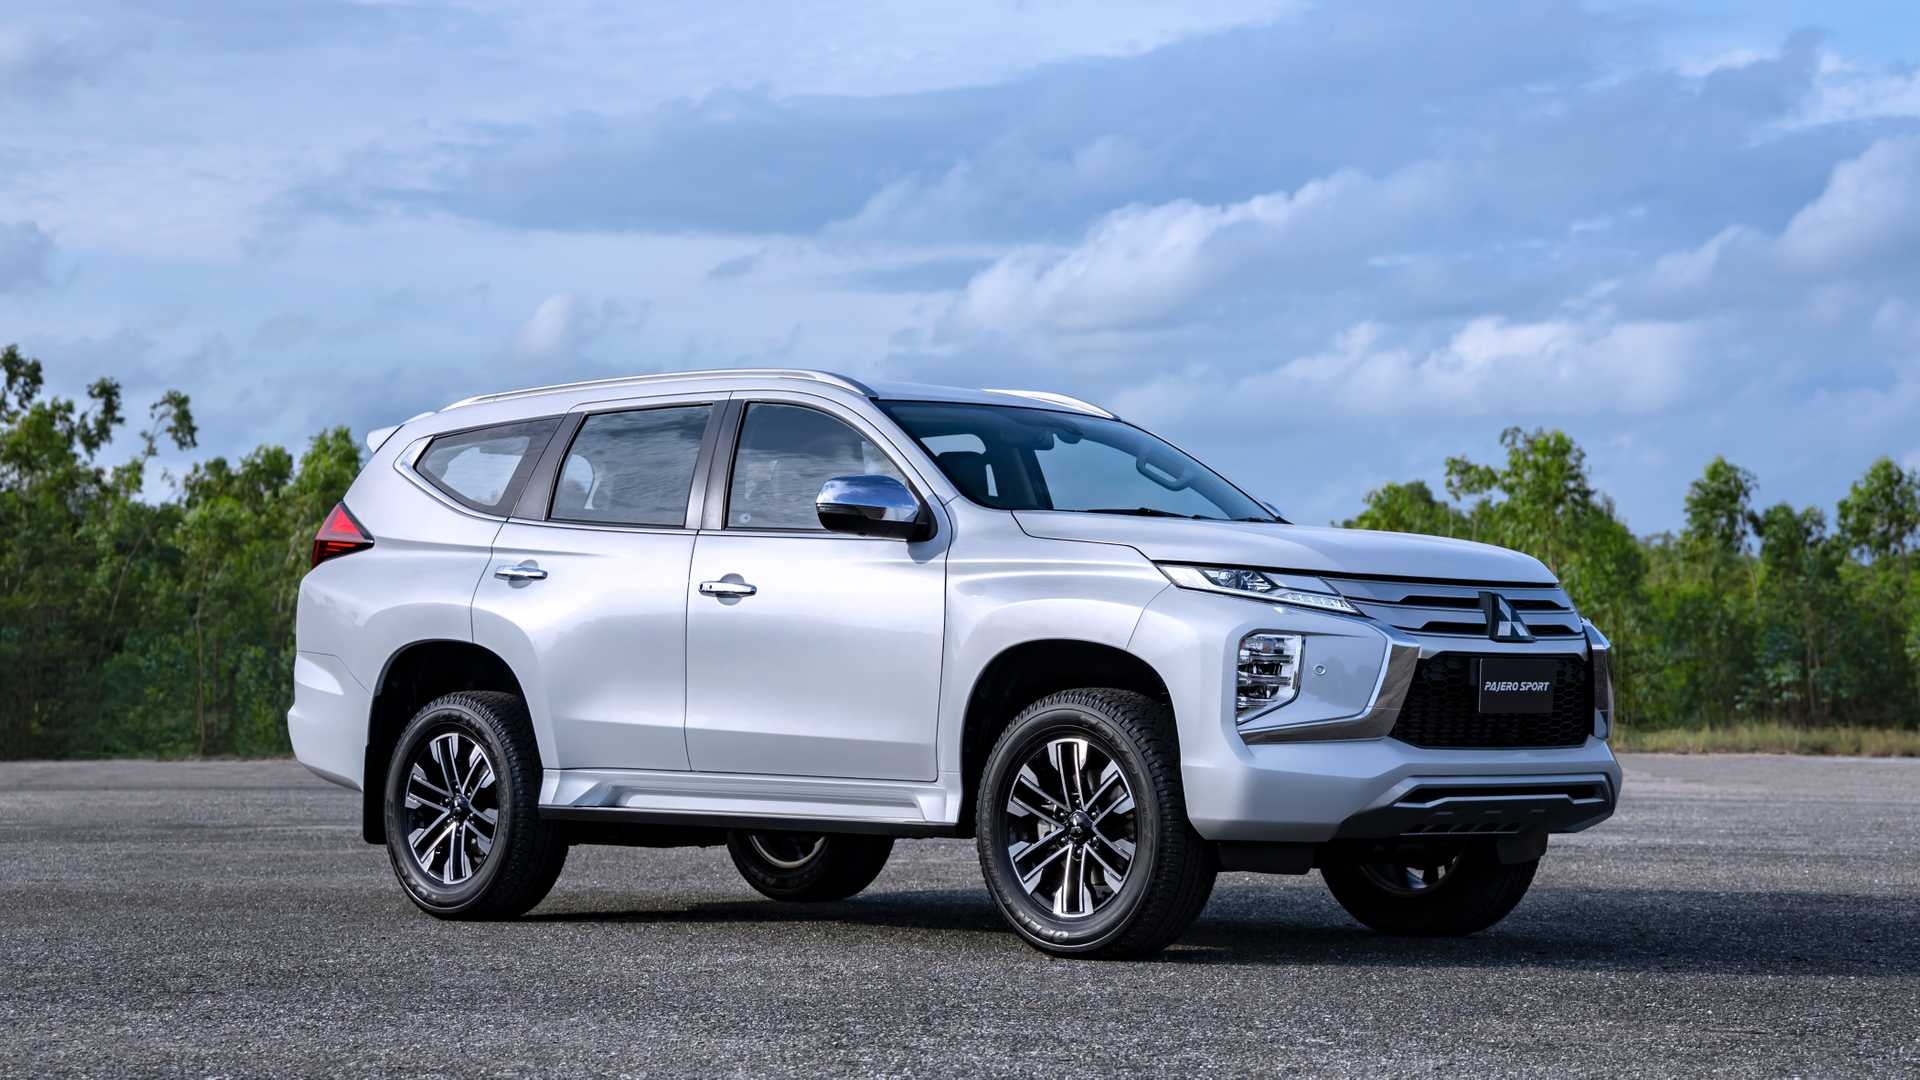 2020-mitsubishi-pajero-sport-facelift-1.jpg